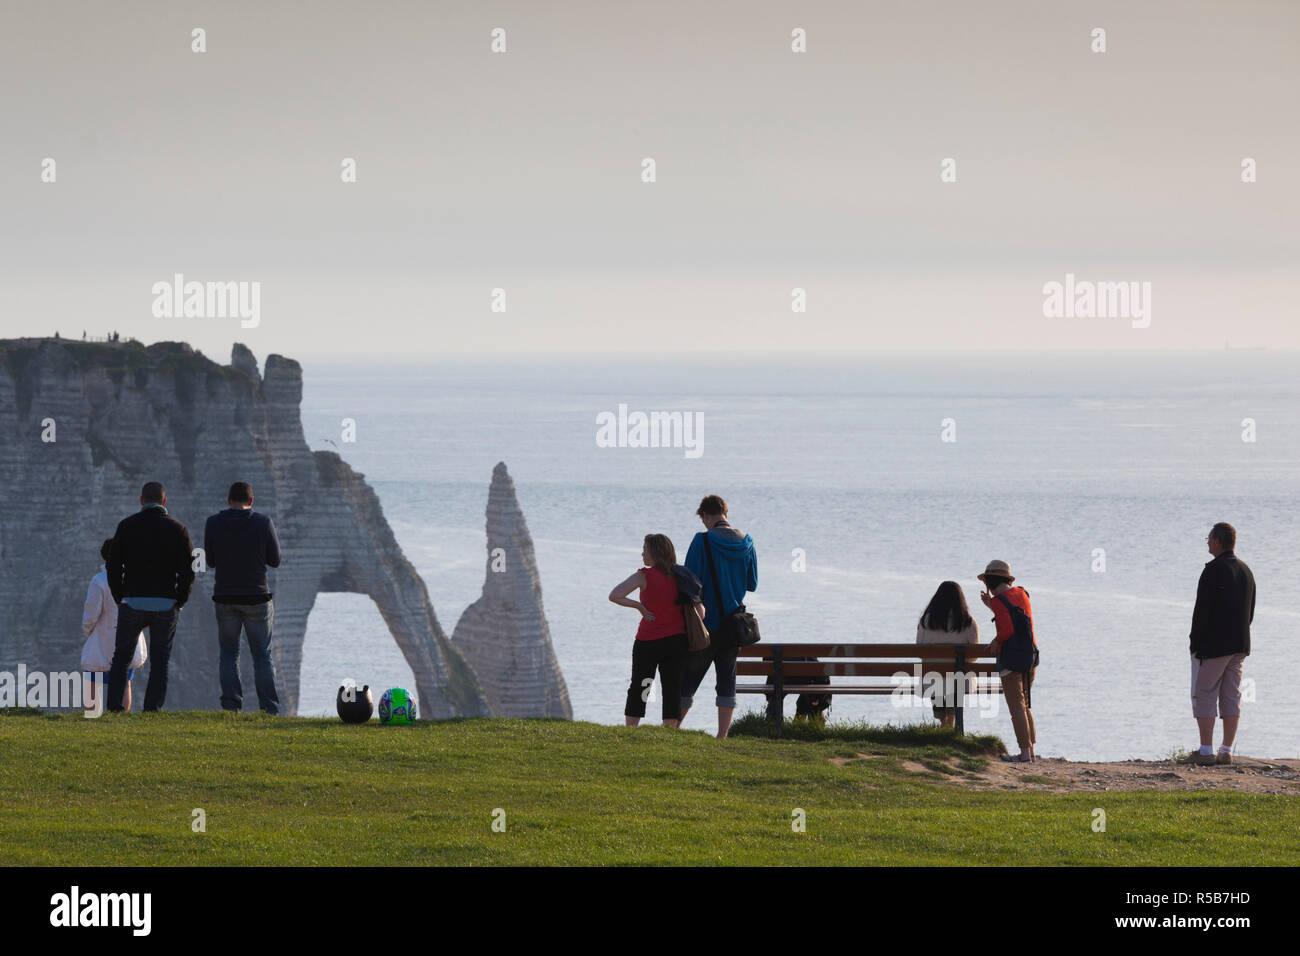 France, Normandy Region, Seine-Maritime Department, Etretat, hikers to the Falaise De Aval cliffs - Stock Image